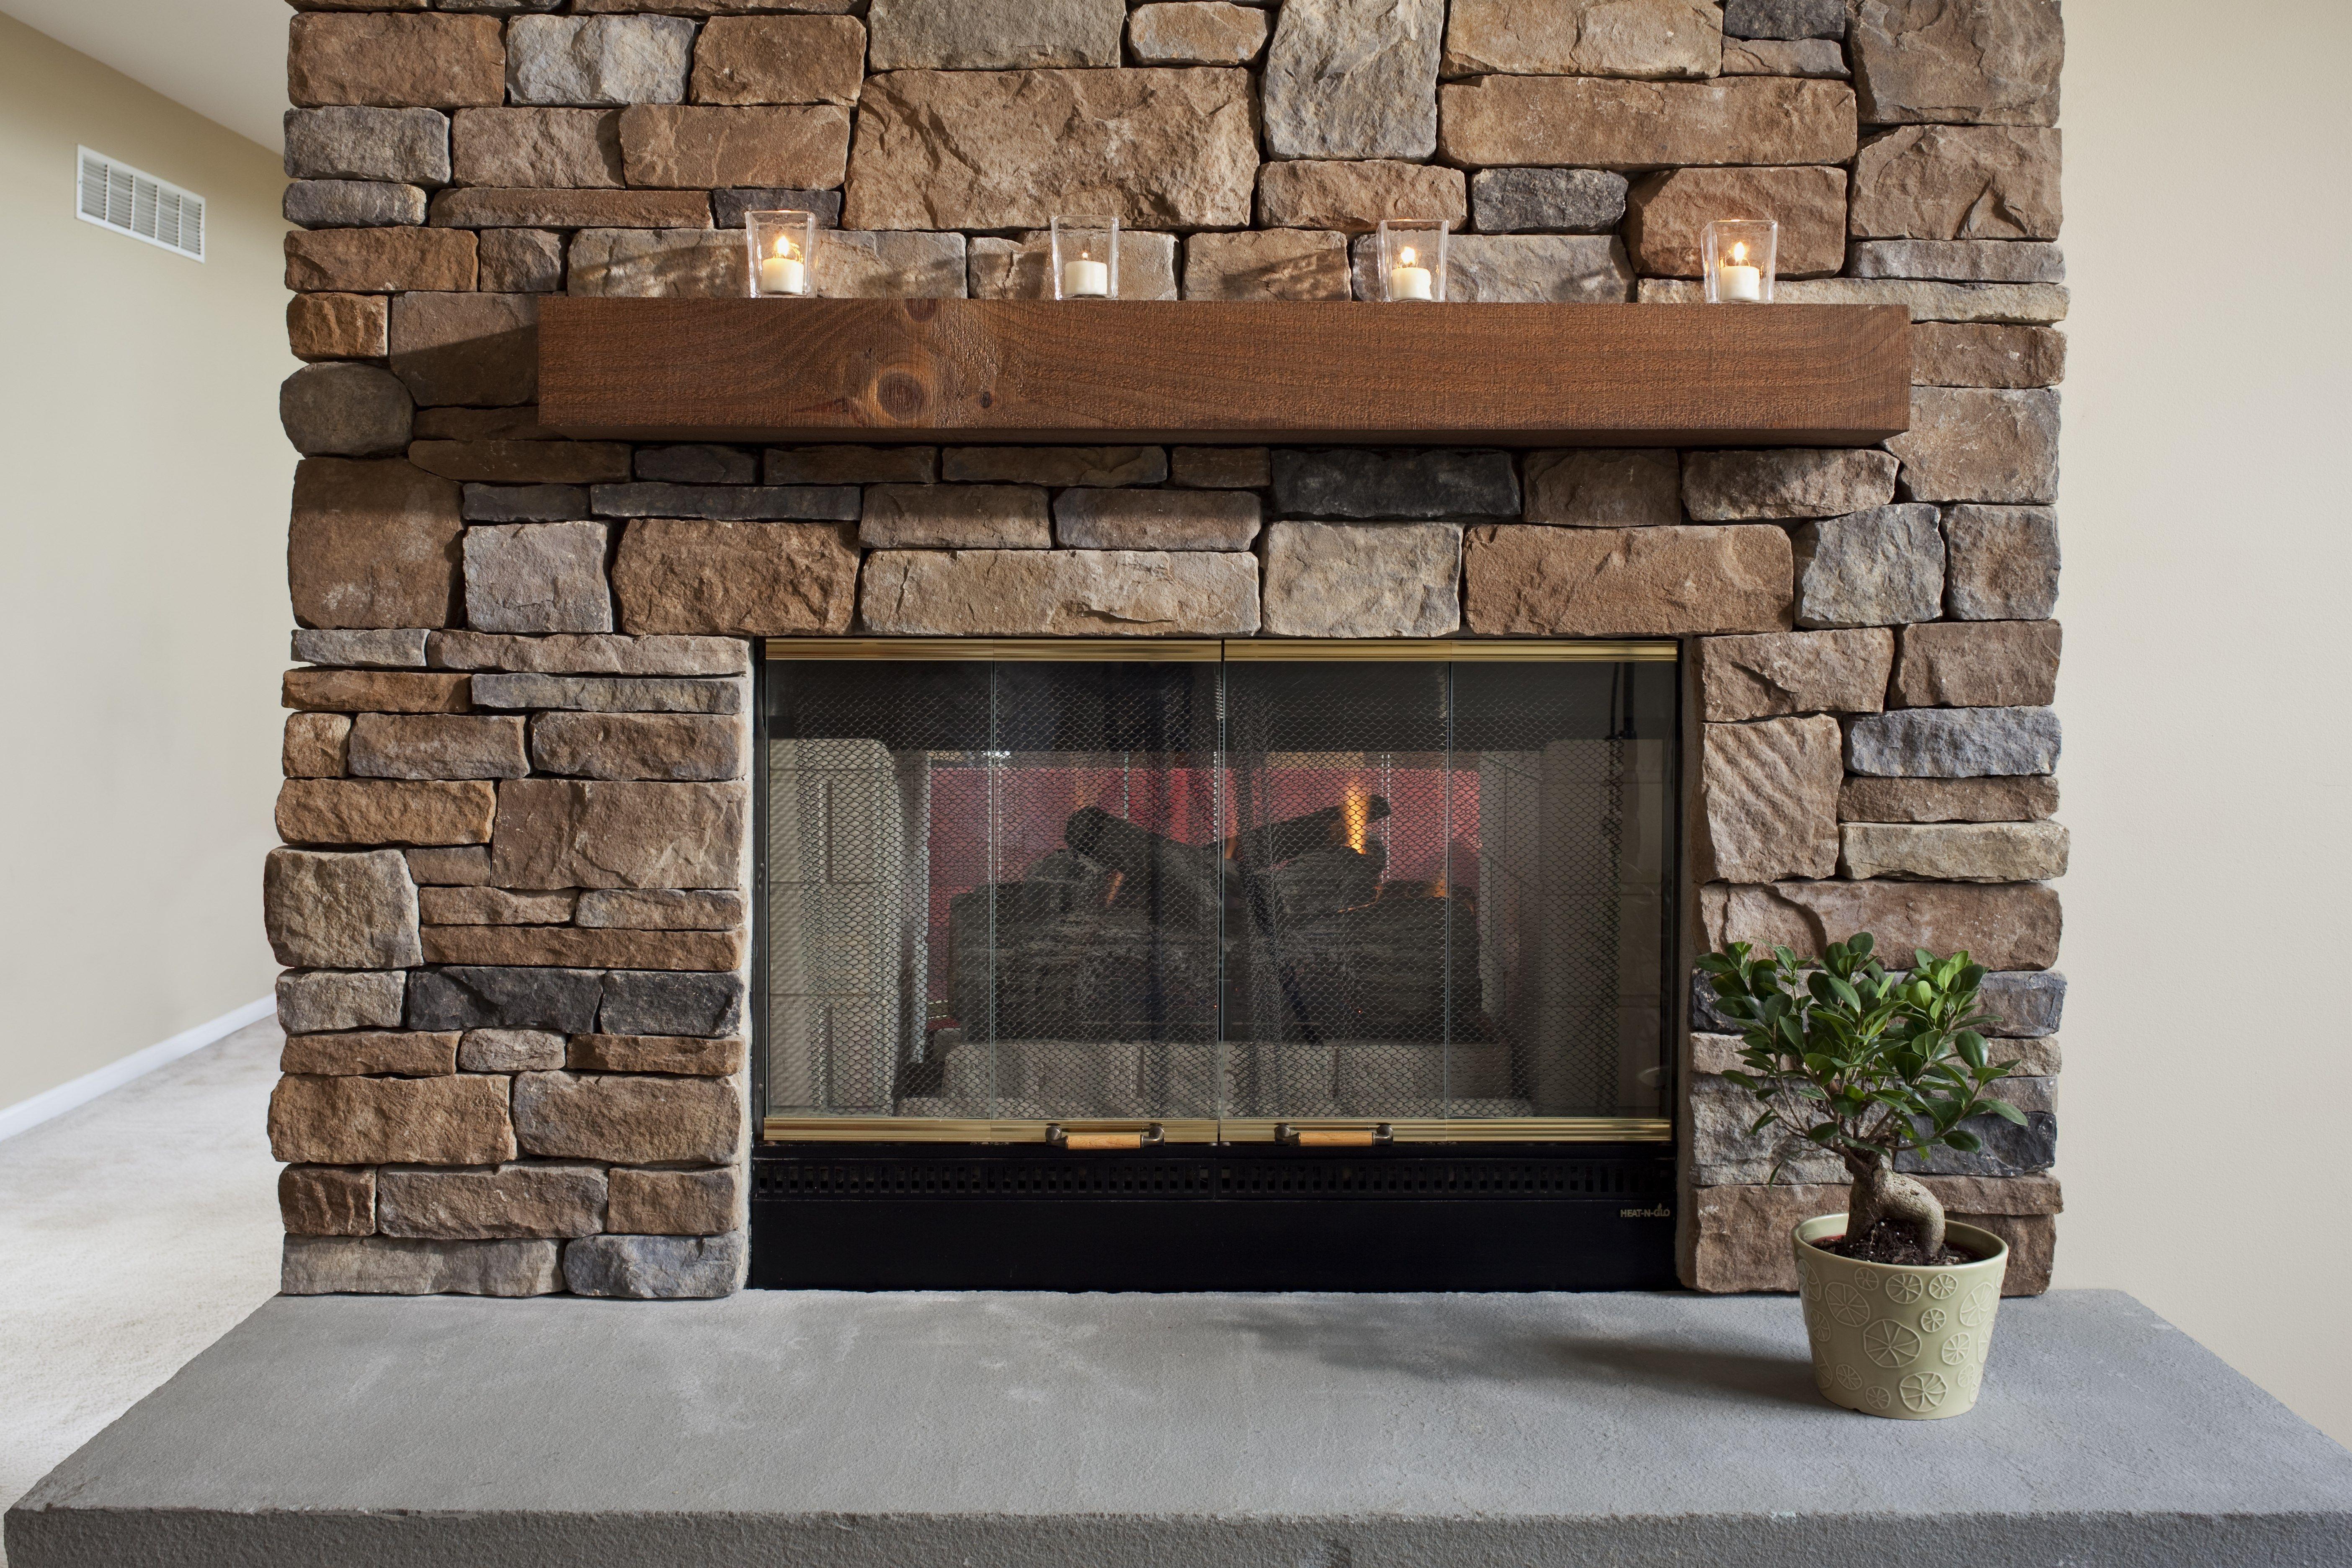 Ep Henry Case Stone Veneer On Interior Fireplace